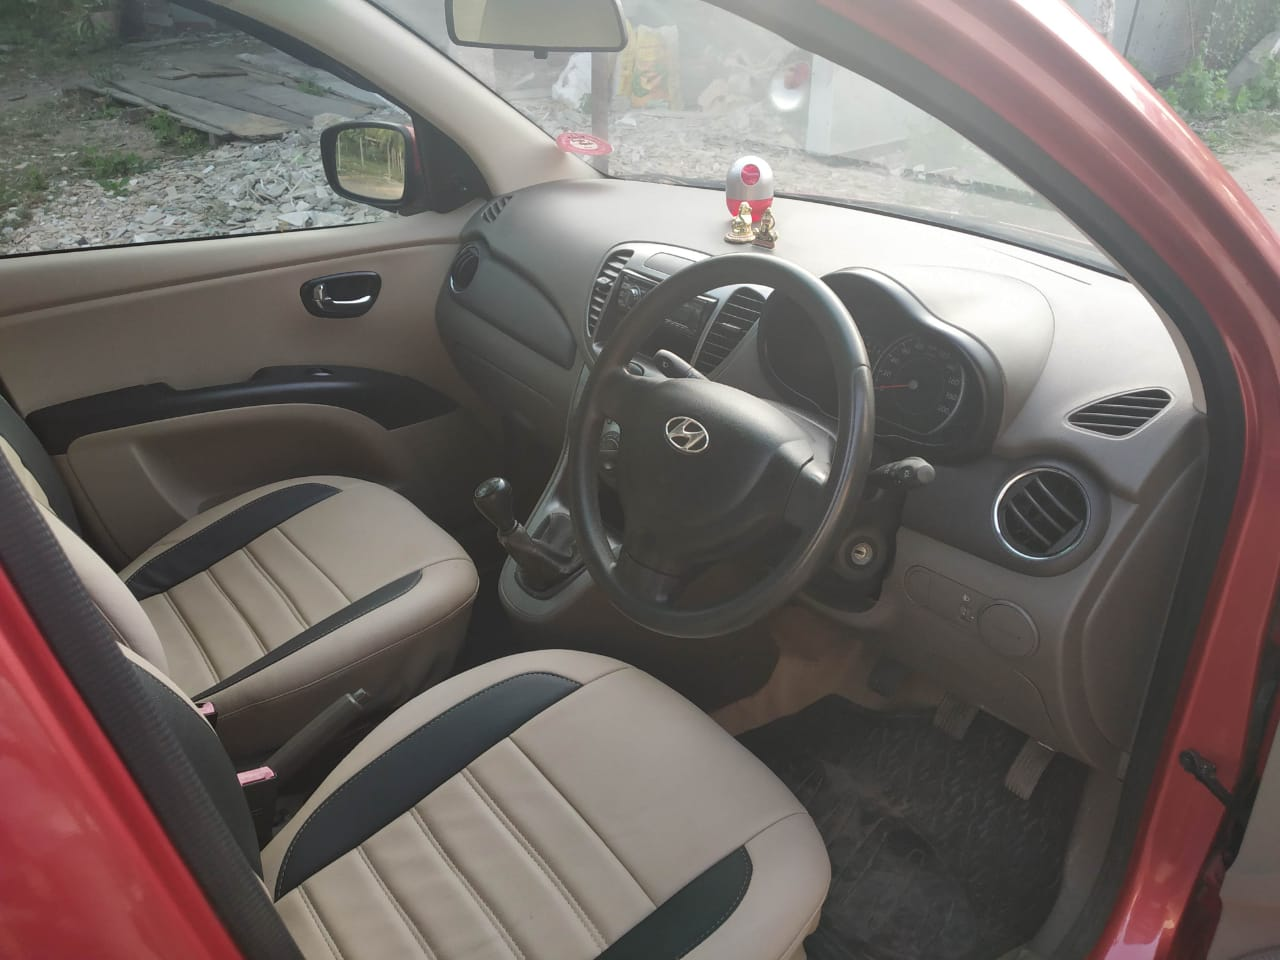 2011 Used Hyundai I10 MAGNA 1.1 IRDE2